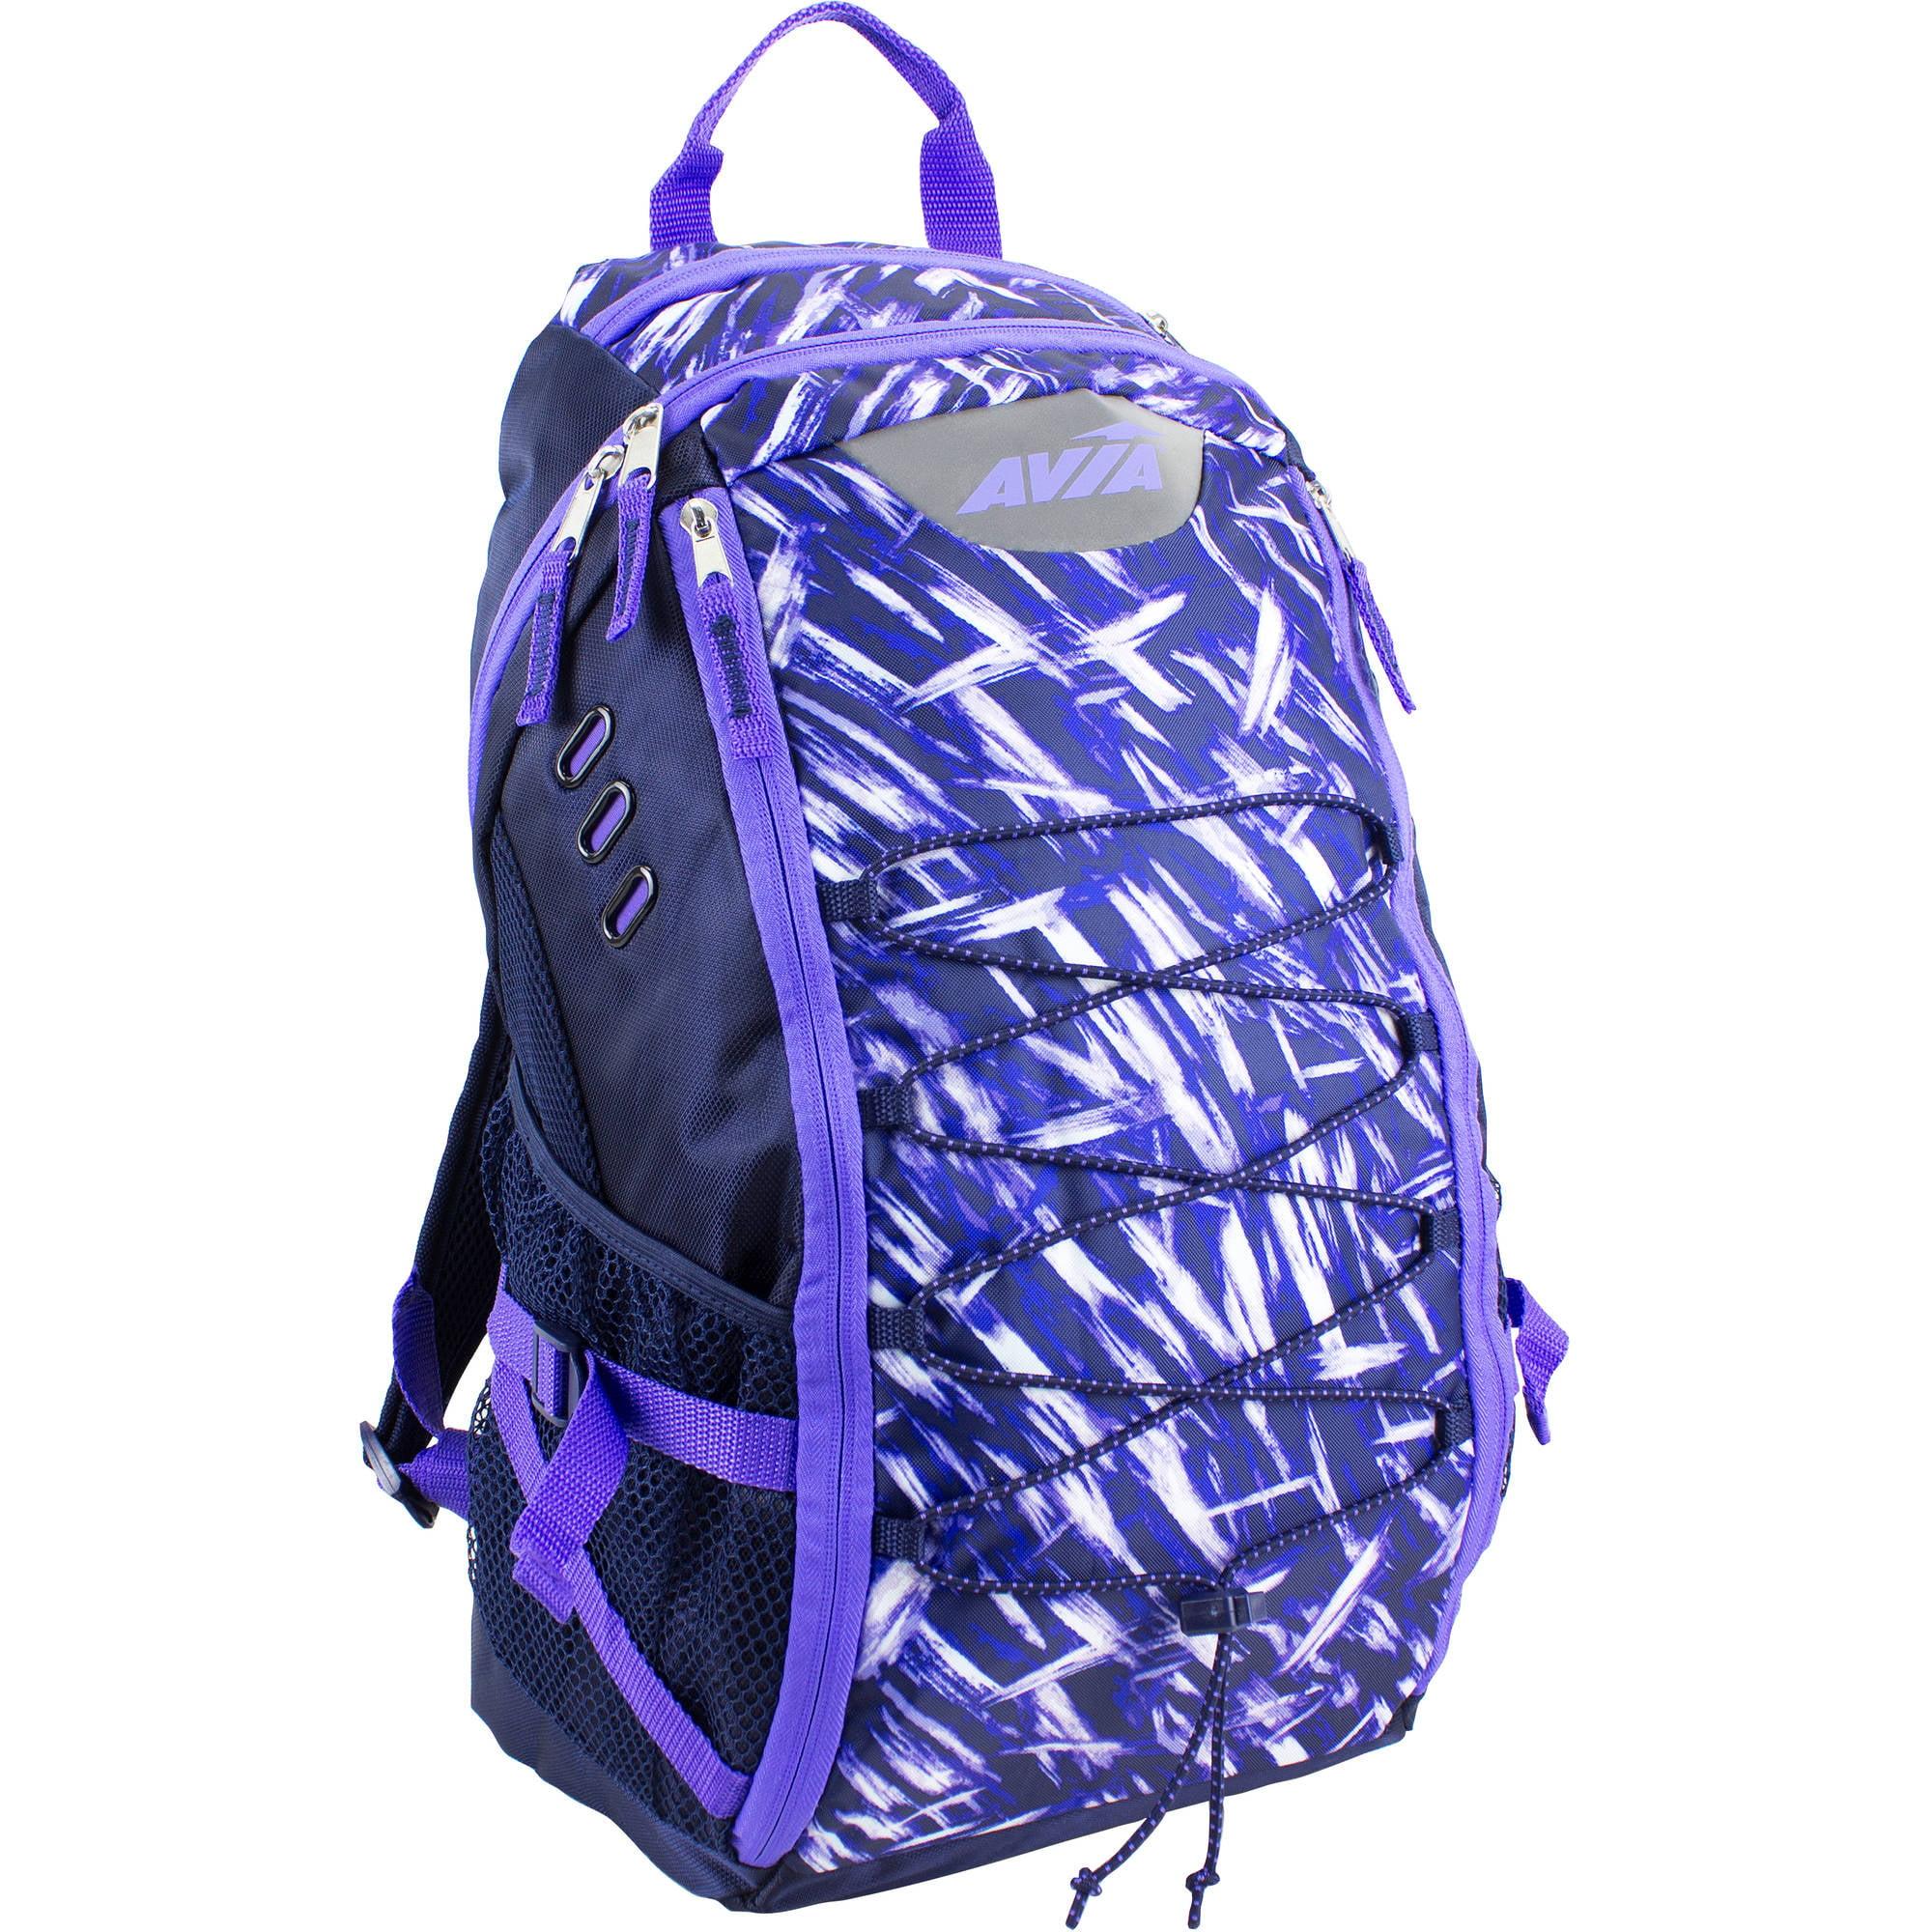 Avia Sport Bungee Backpack